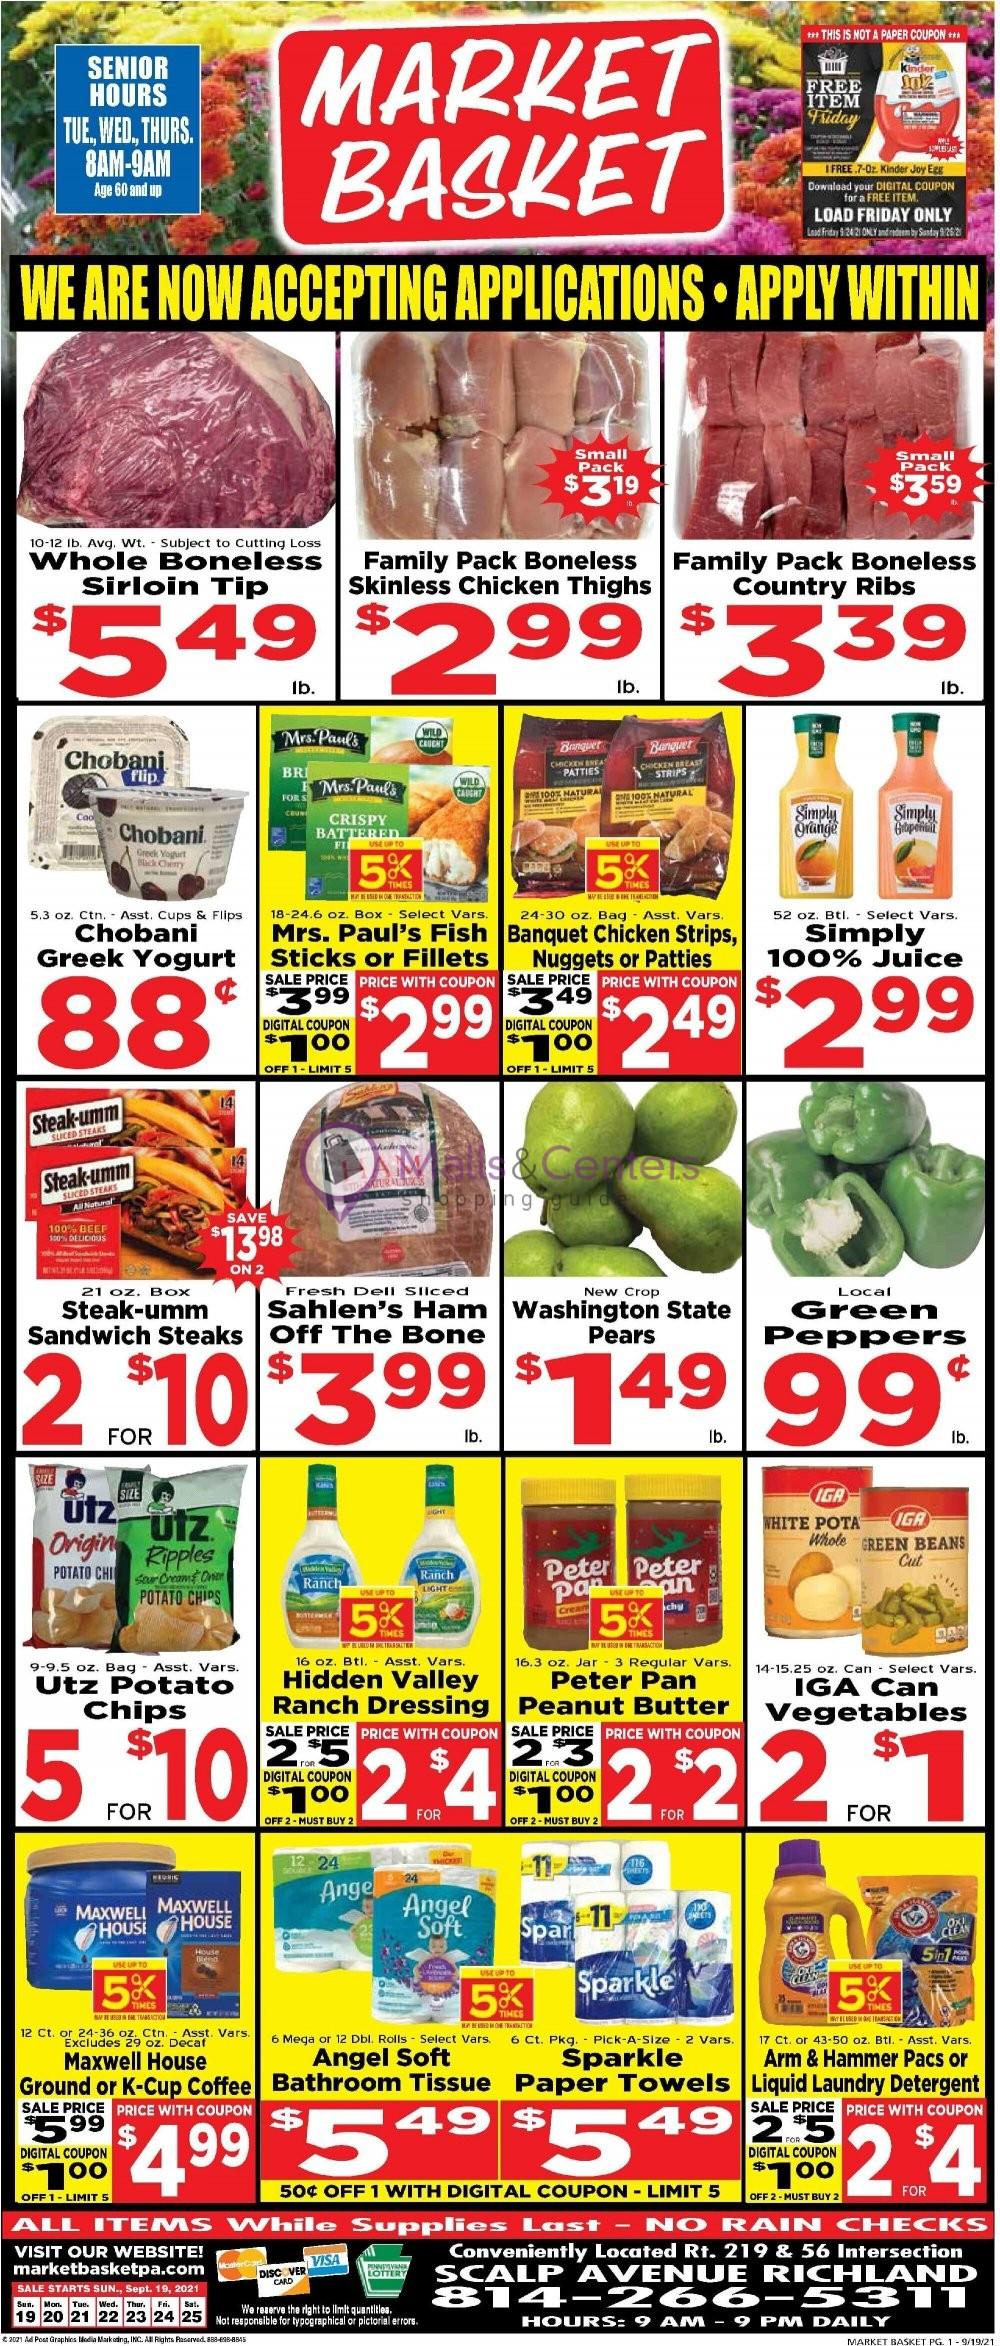 weekly ads Market Basket PA - page 1 - mallscenters.com